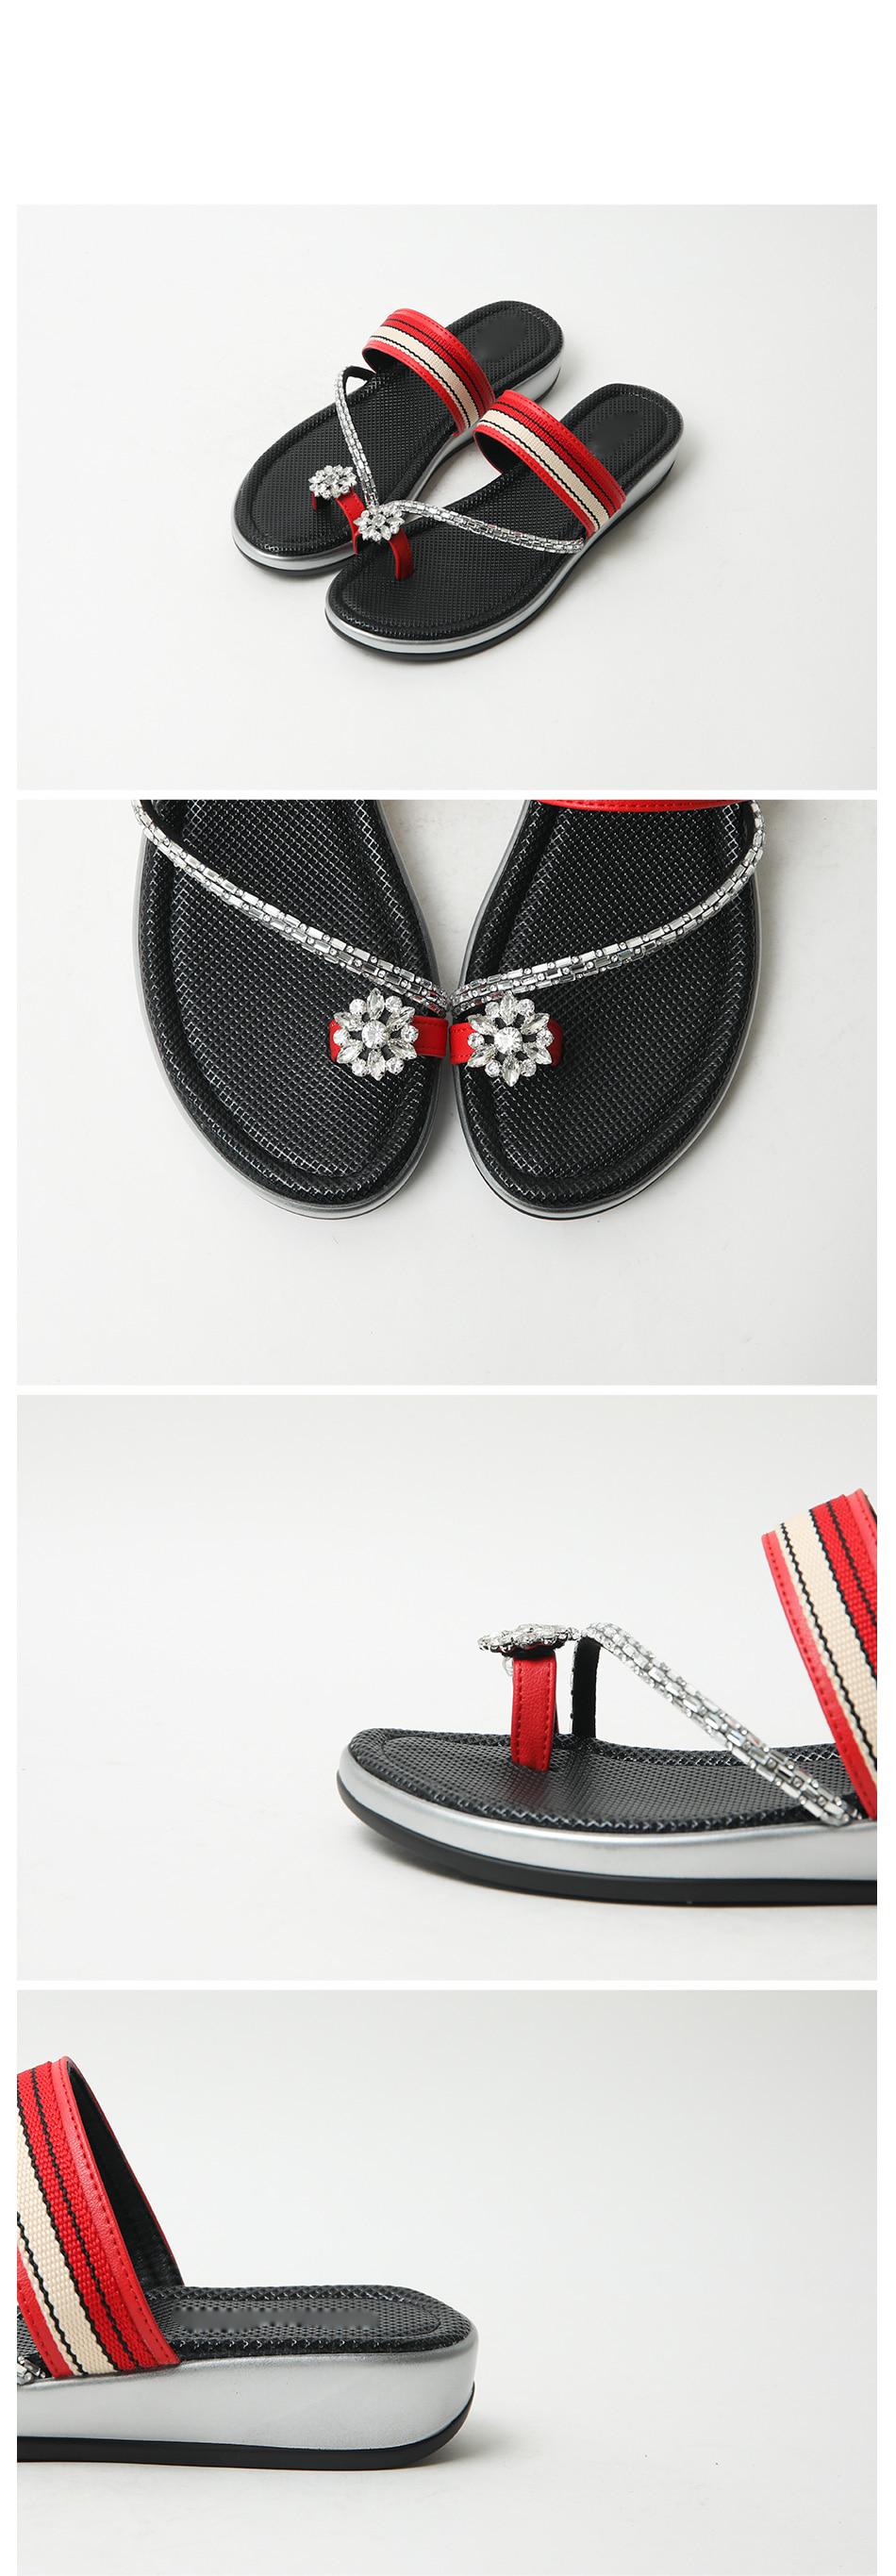 Sun Beach Slippers 3cm